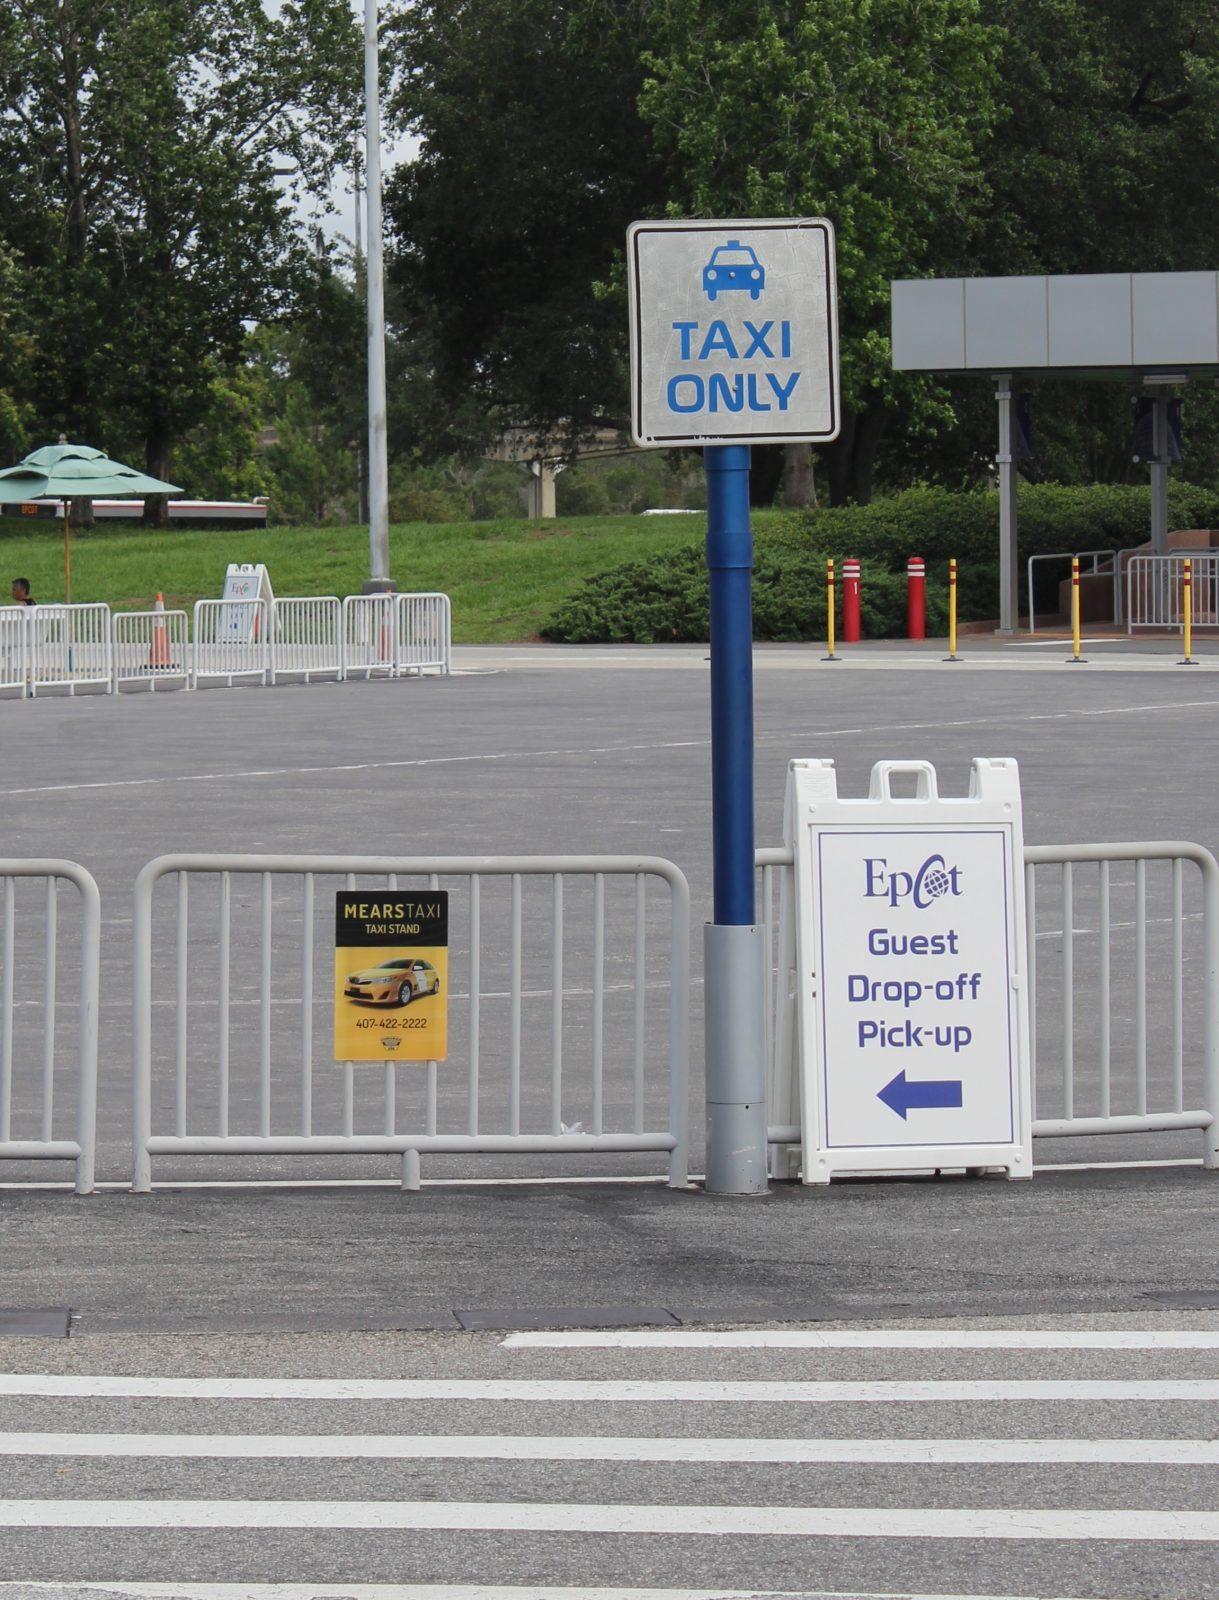 taxi sign at Epcot